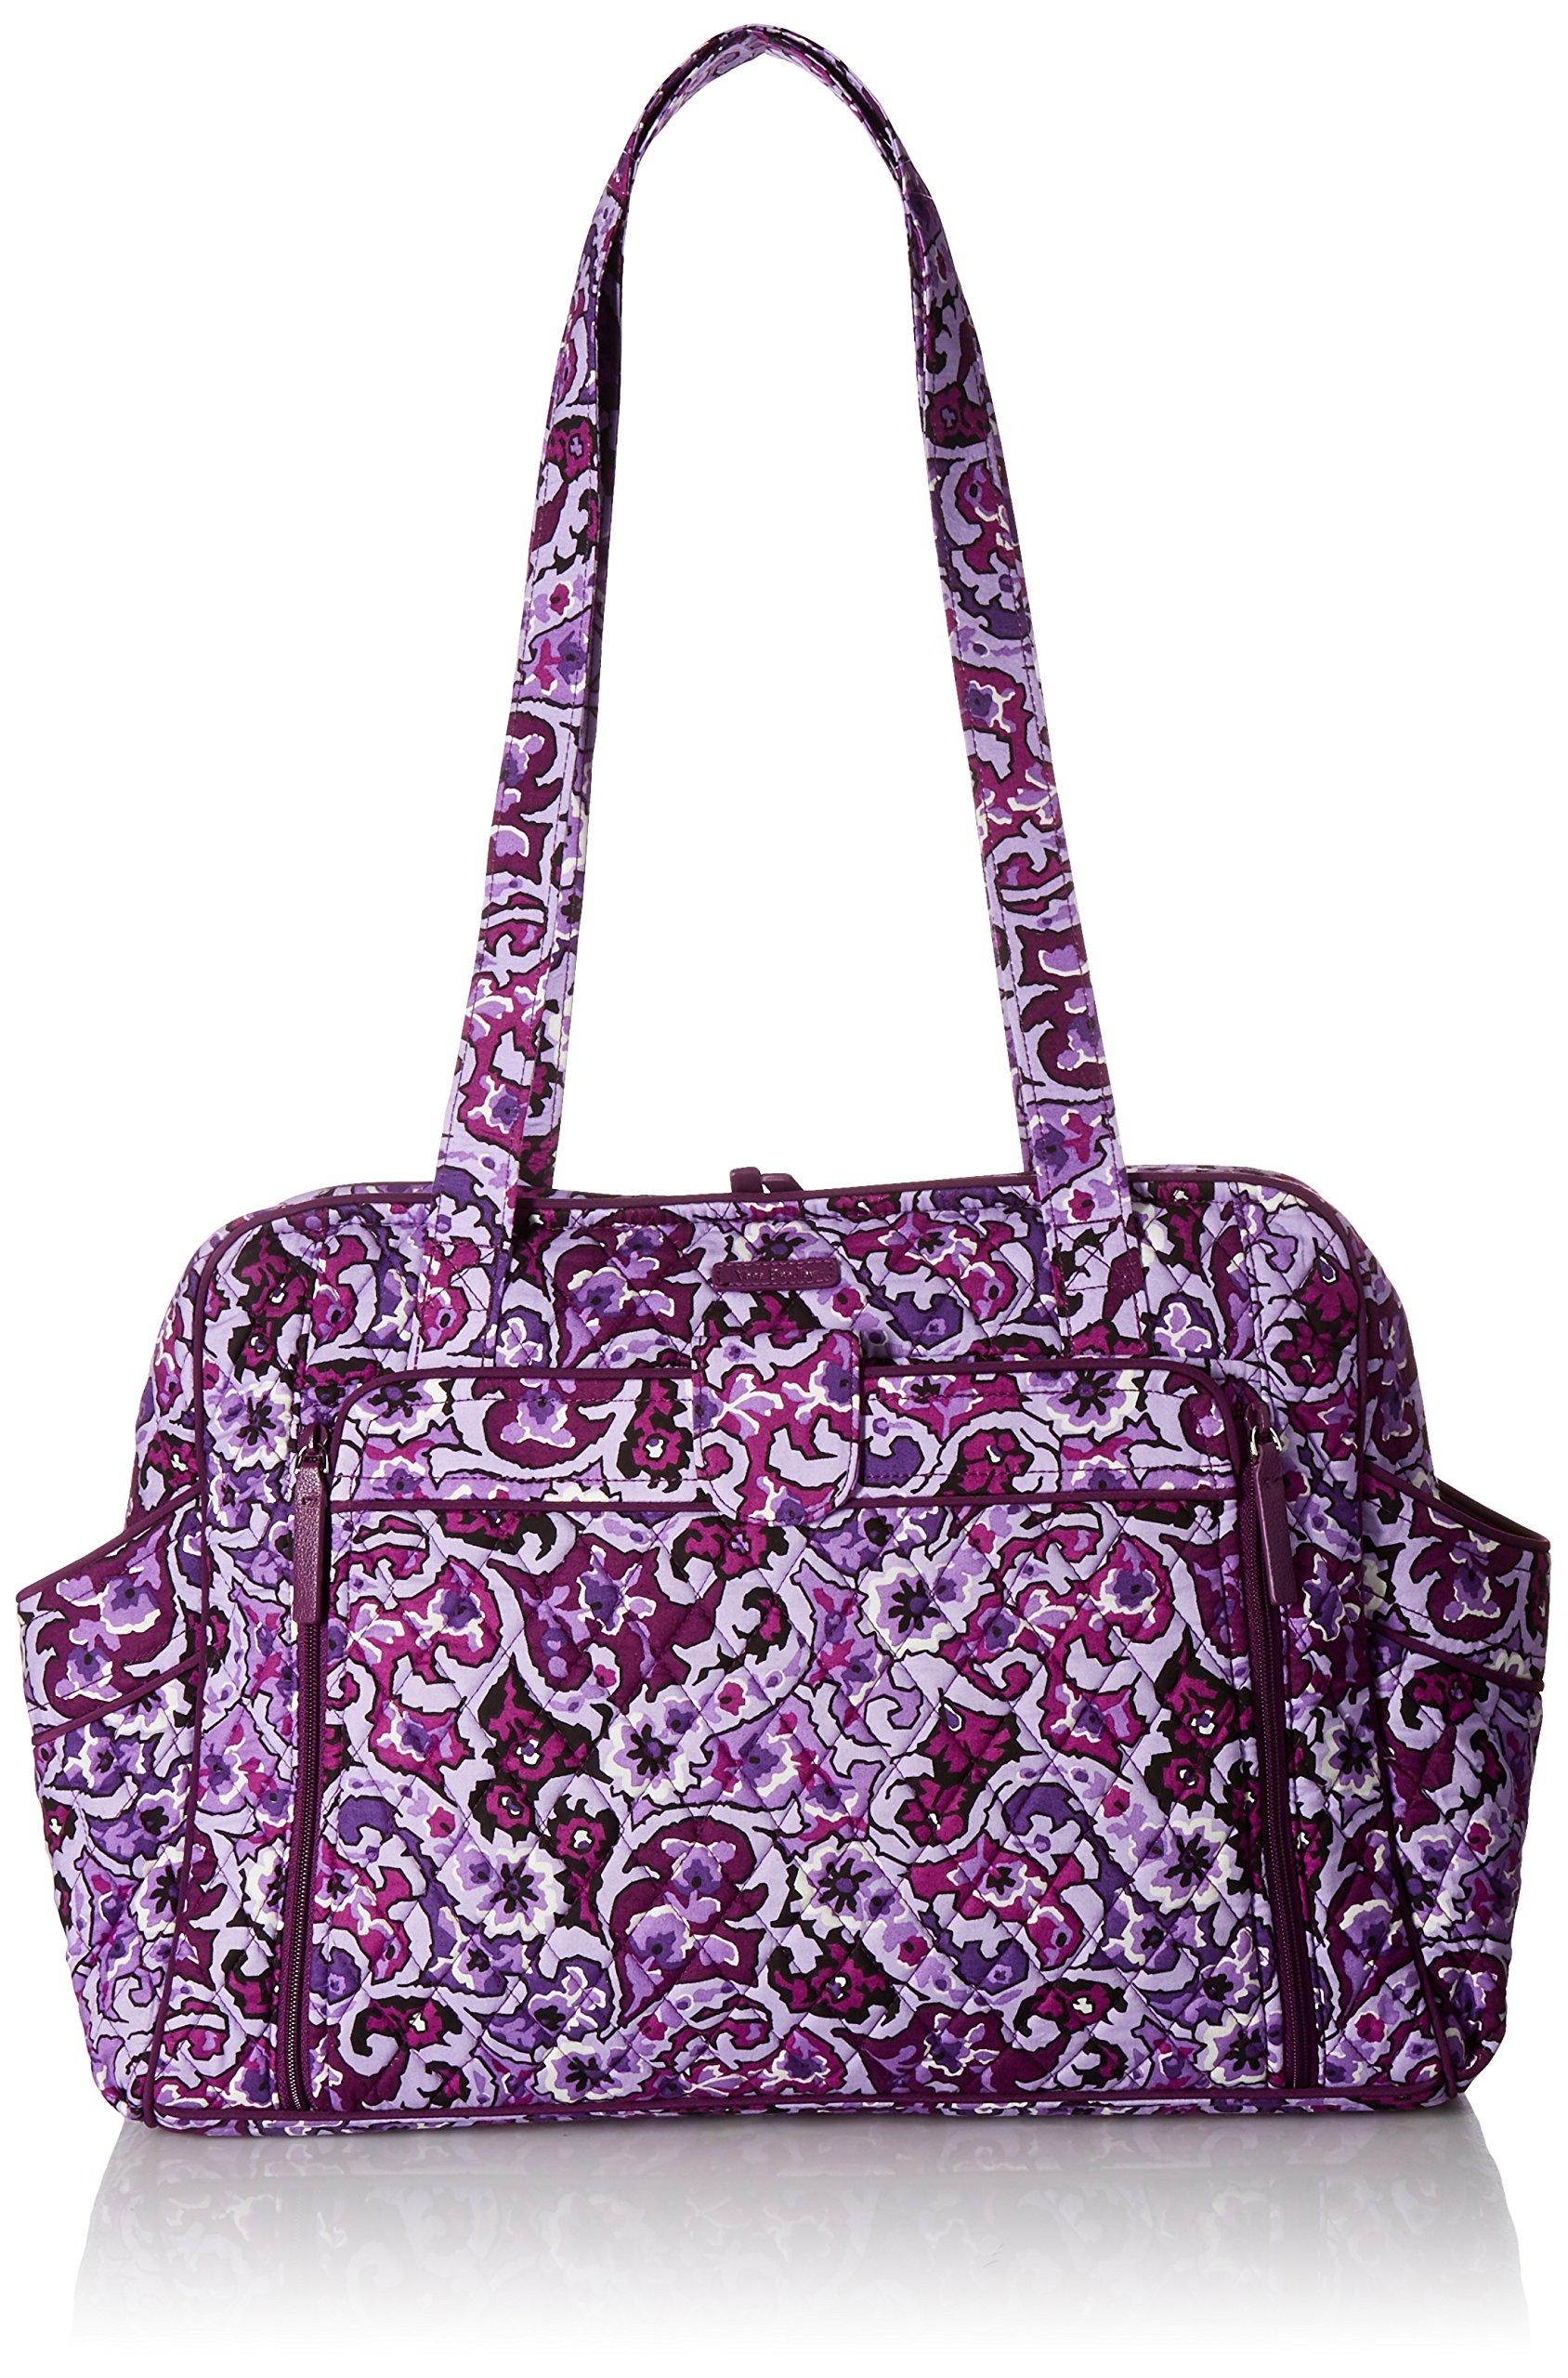 Vera Bradley Women's Stroll Around Baby Bag, Lilac Paisley by Vera Bradley